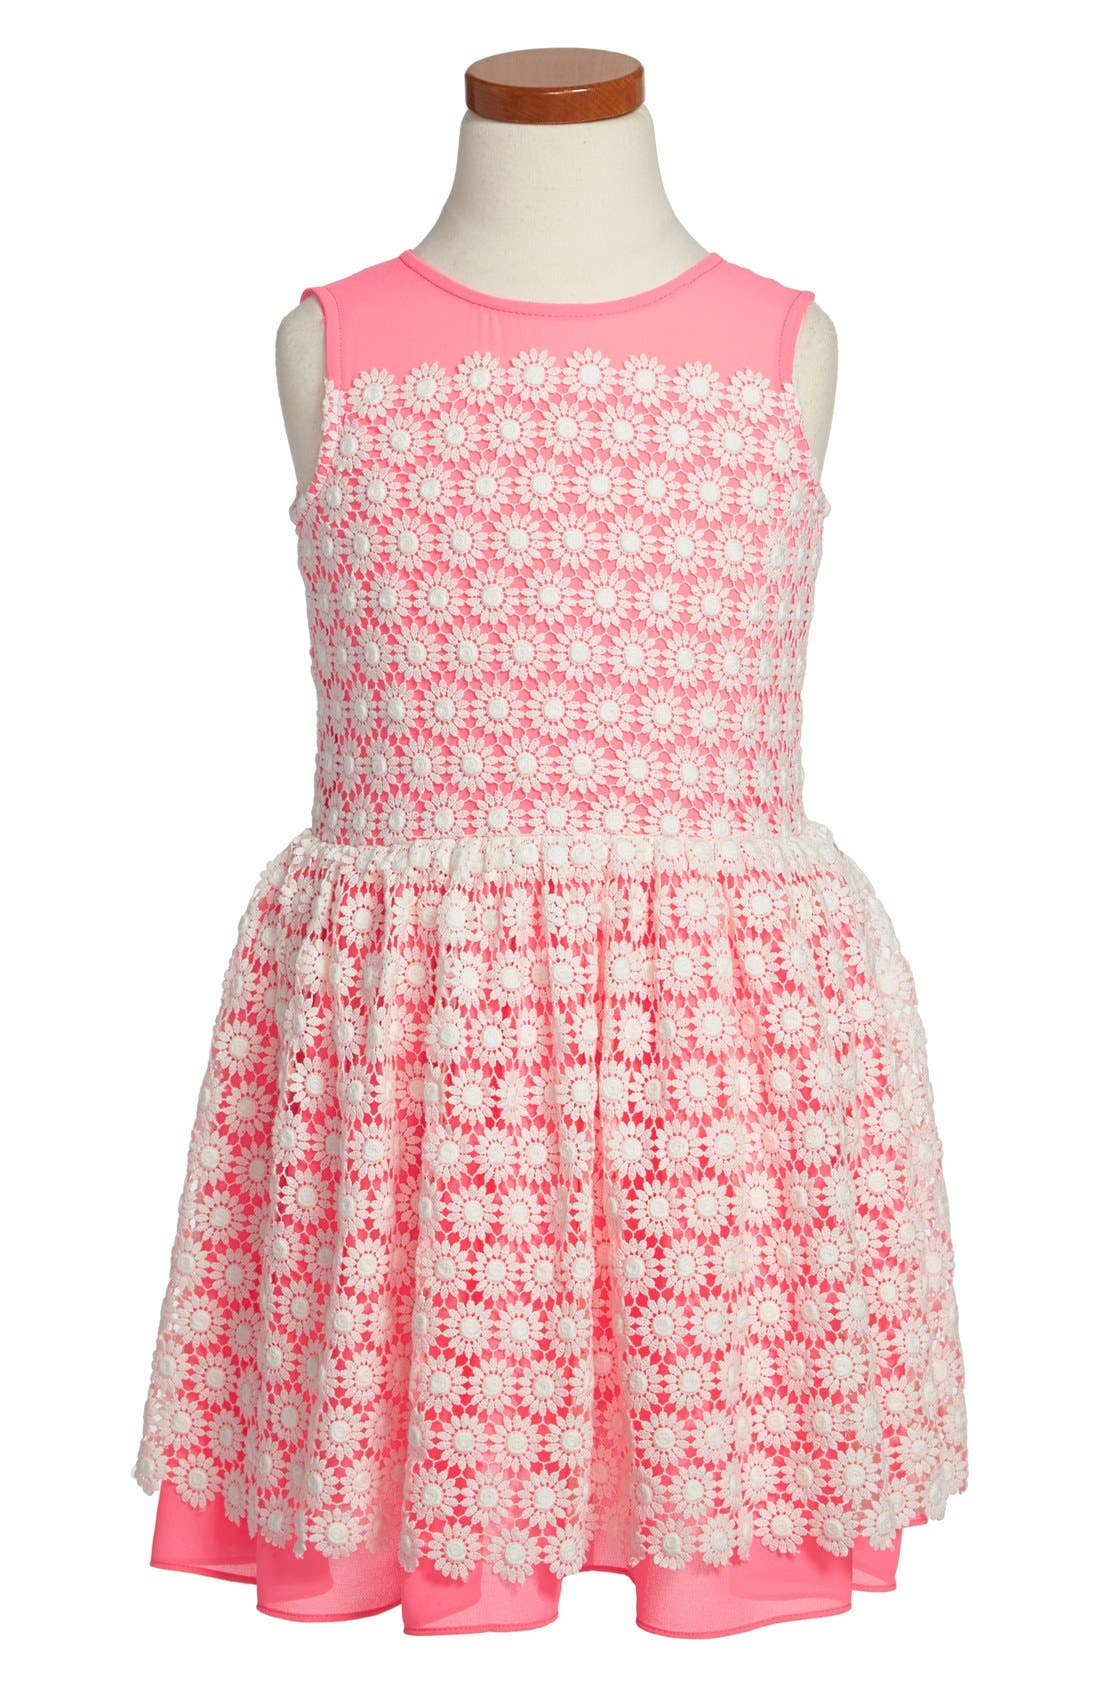 Alternate Image 1 Selected - Halabaloo Crochet Lace Party Dress (Toddler Girls & Little Girls)